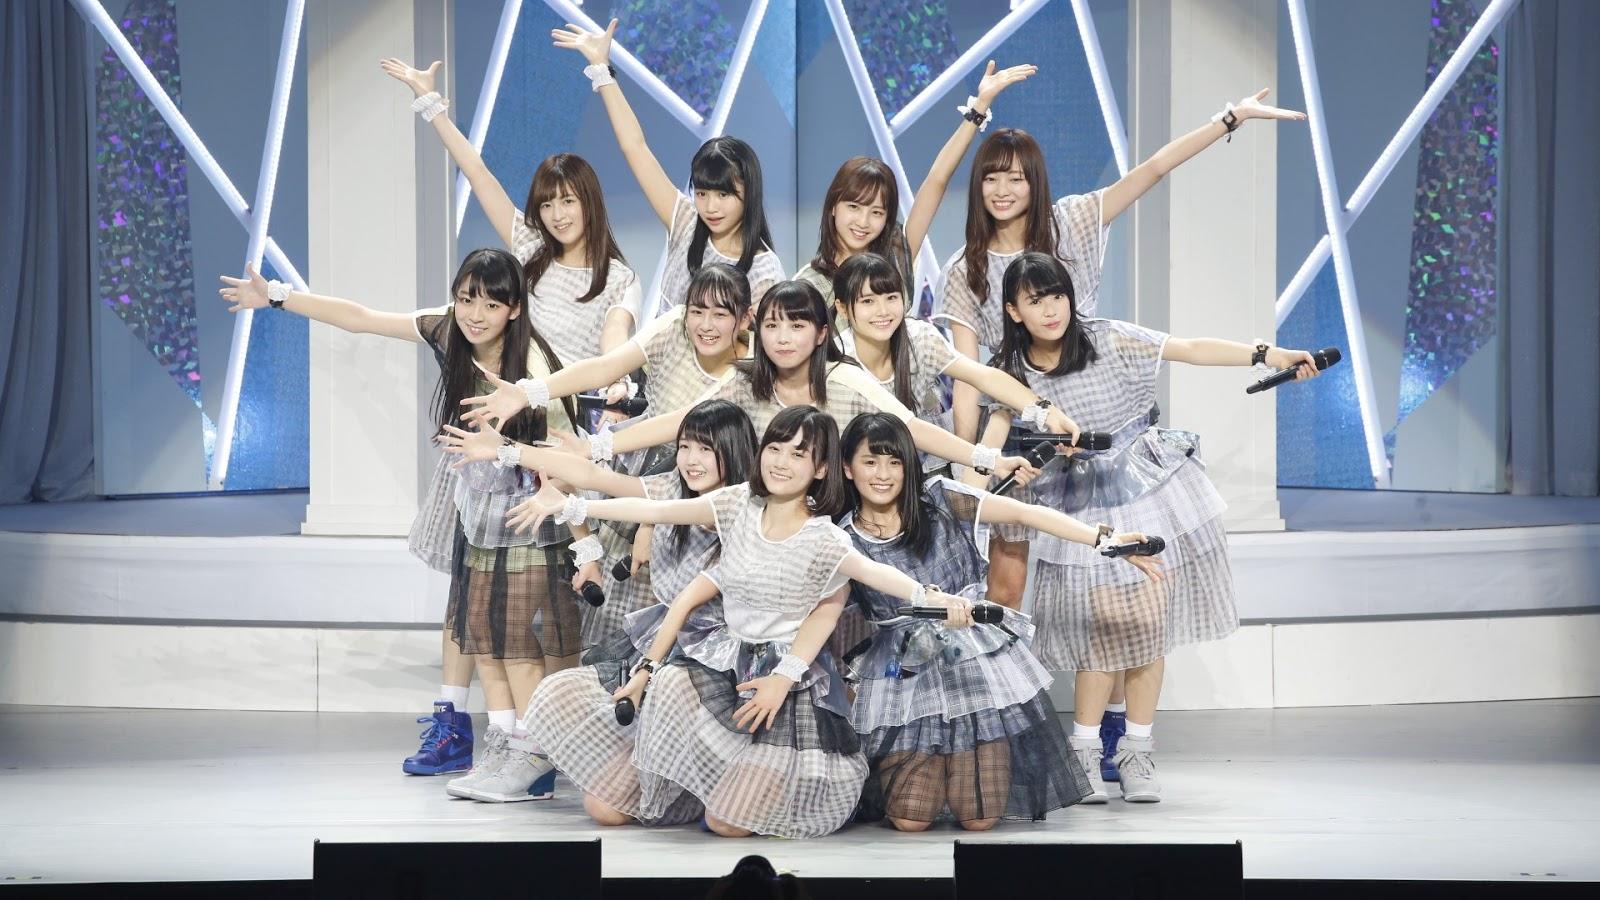 Nogizaka46 3rd Generation Omitatekai 161210 (Nogidoga)